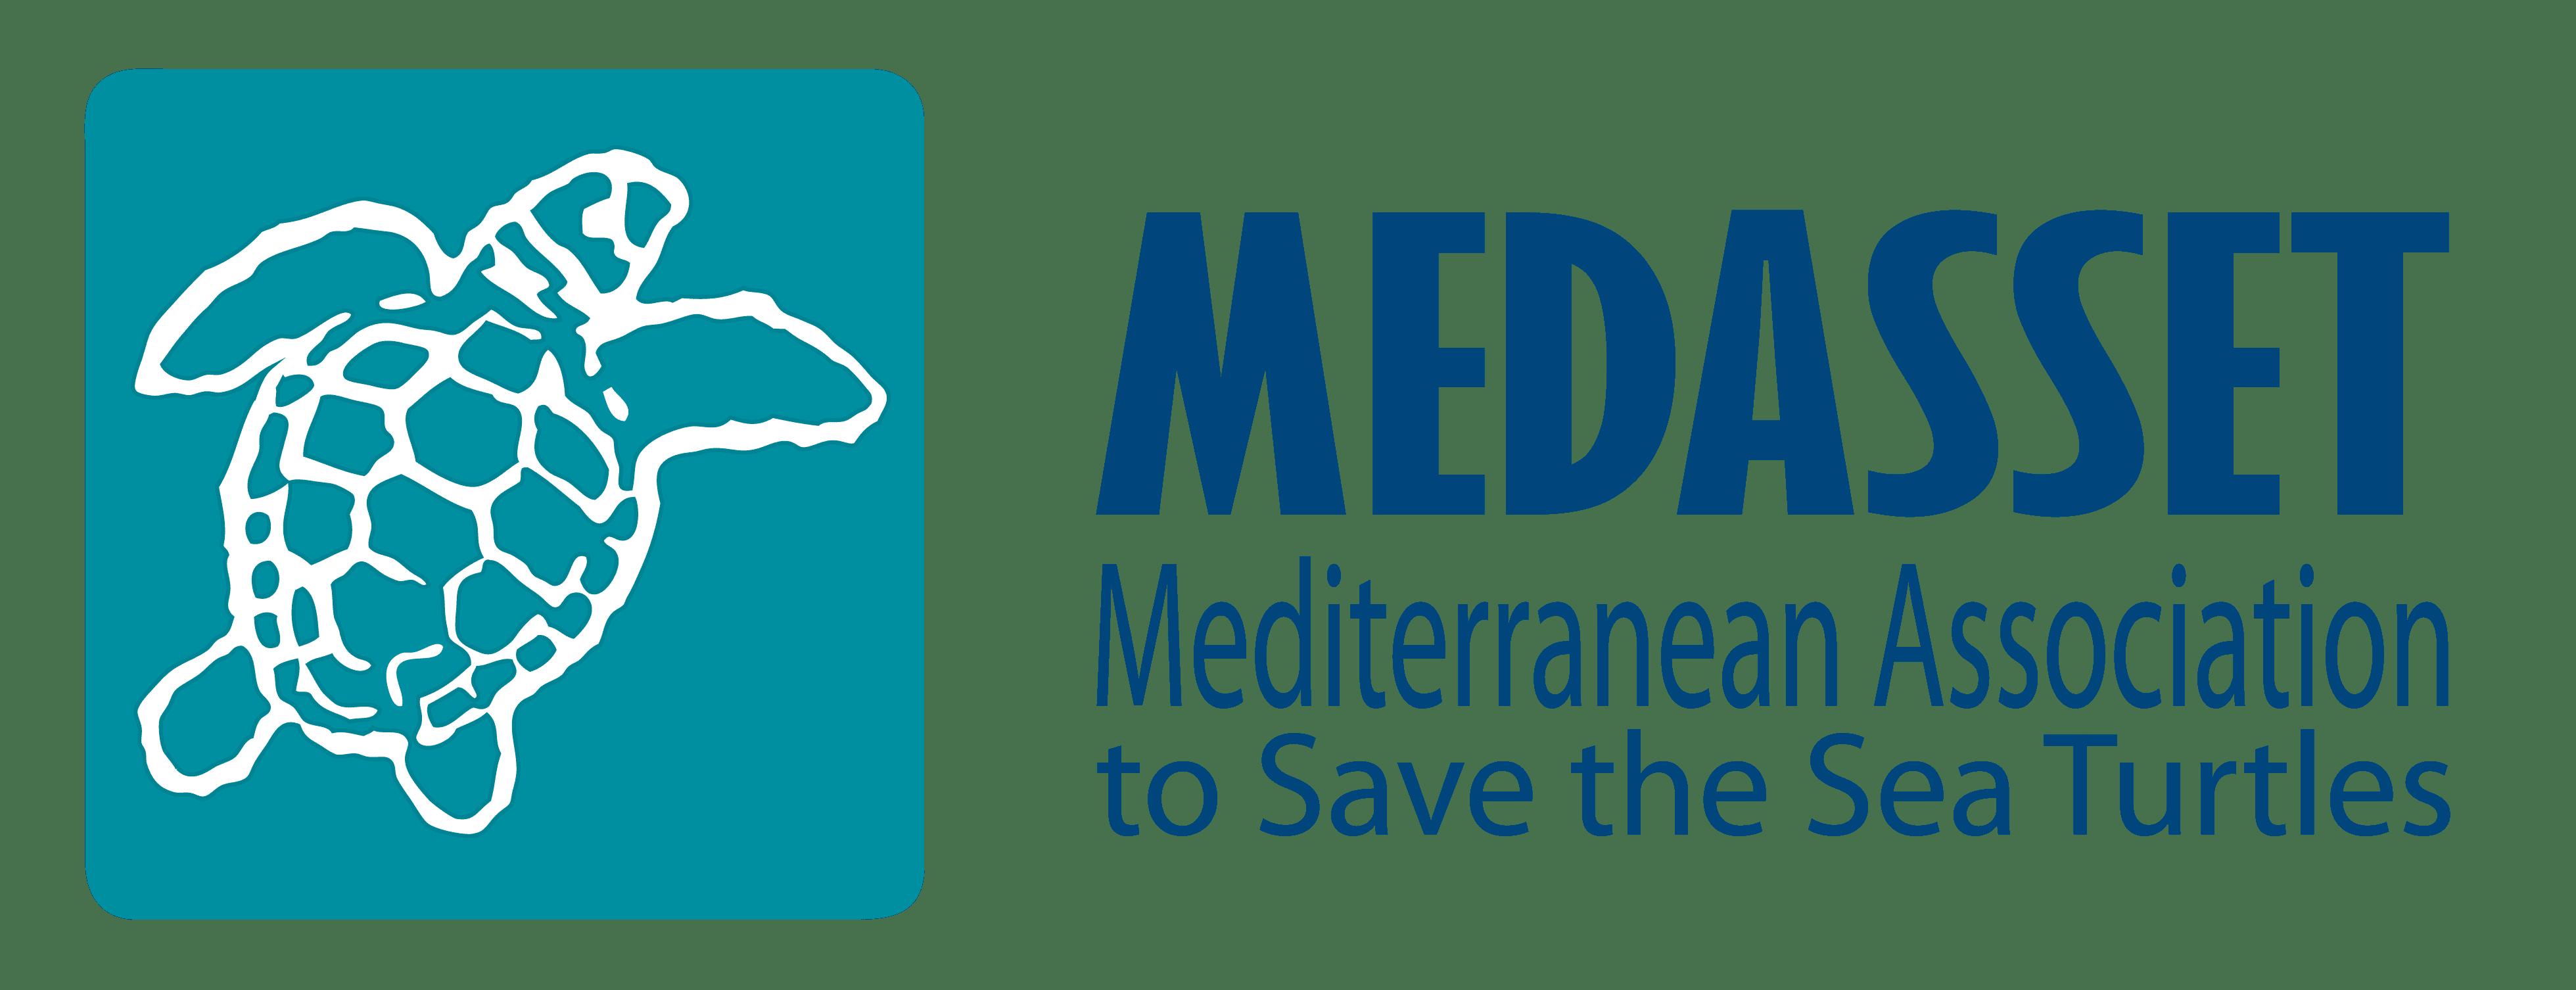 Medasset-logo